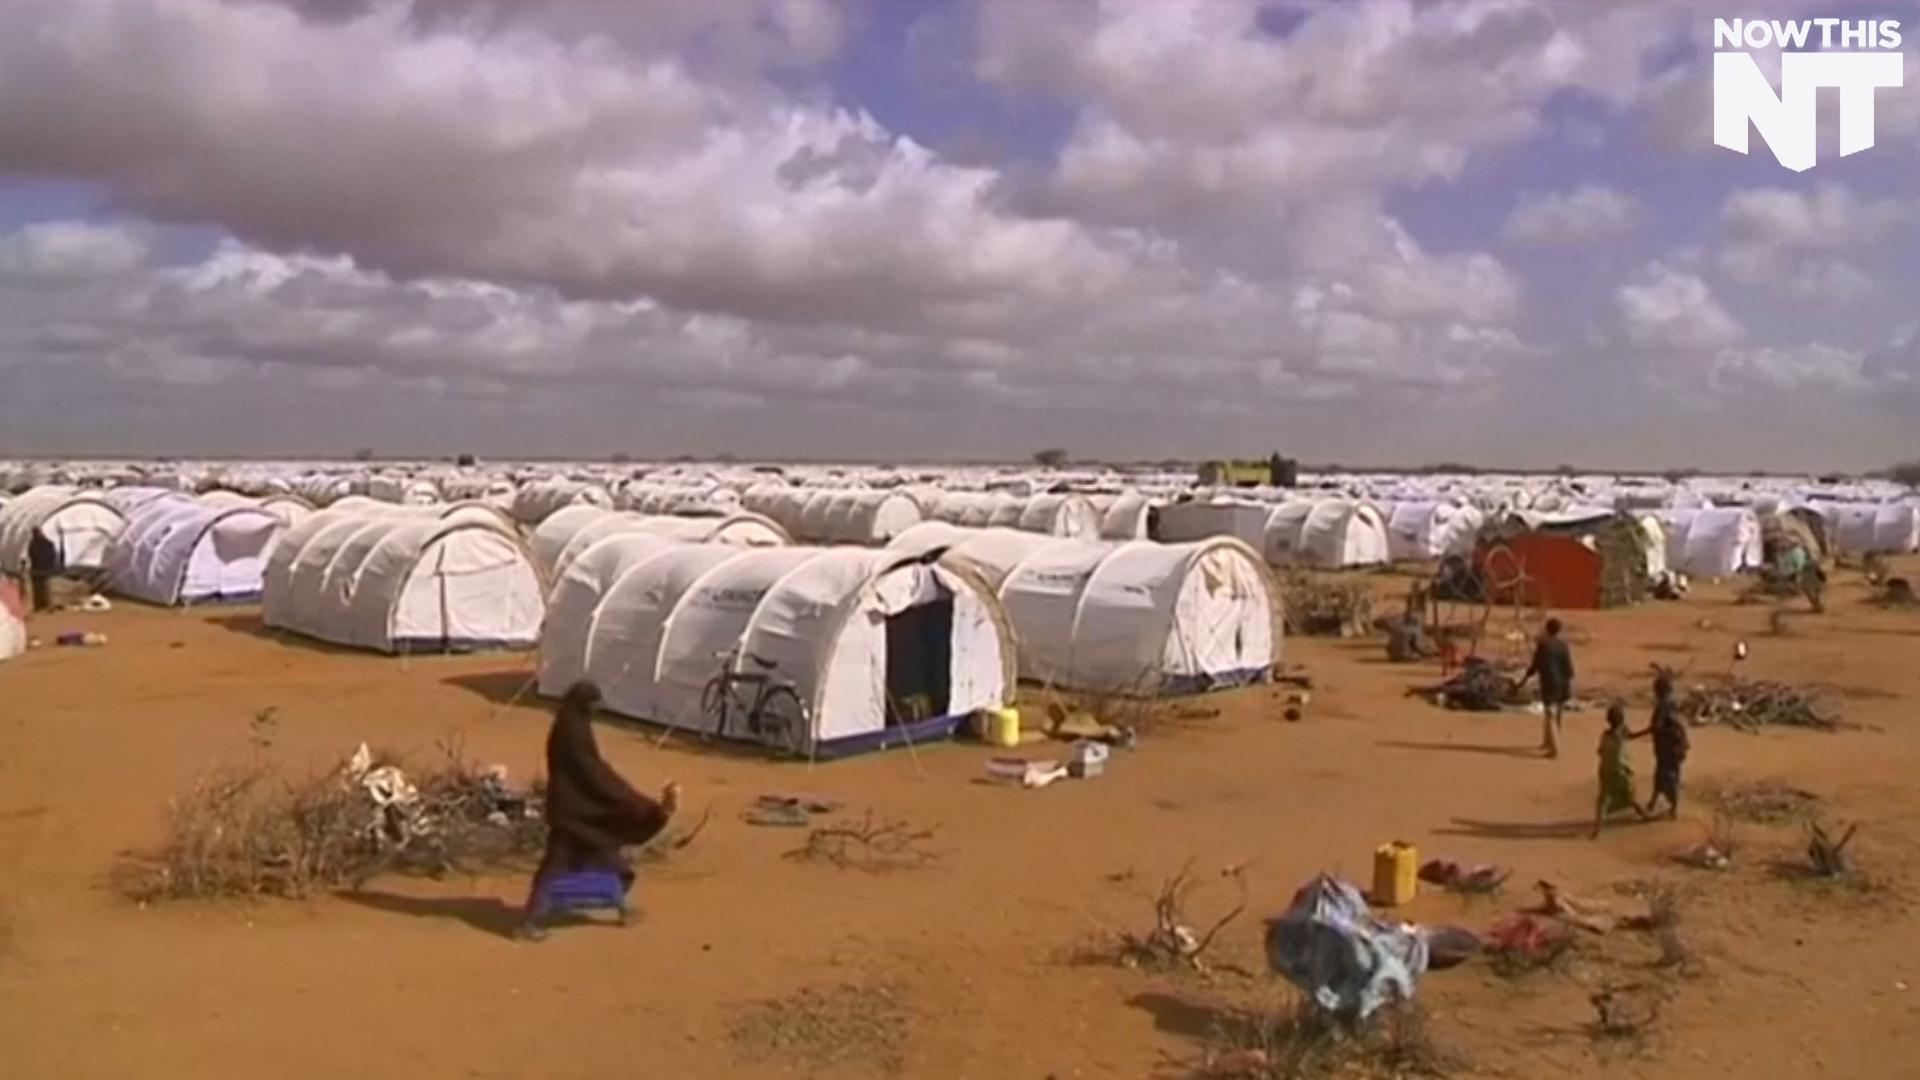 Kenya Closing World's Largest Refugee Camp